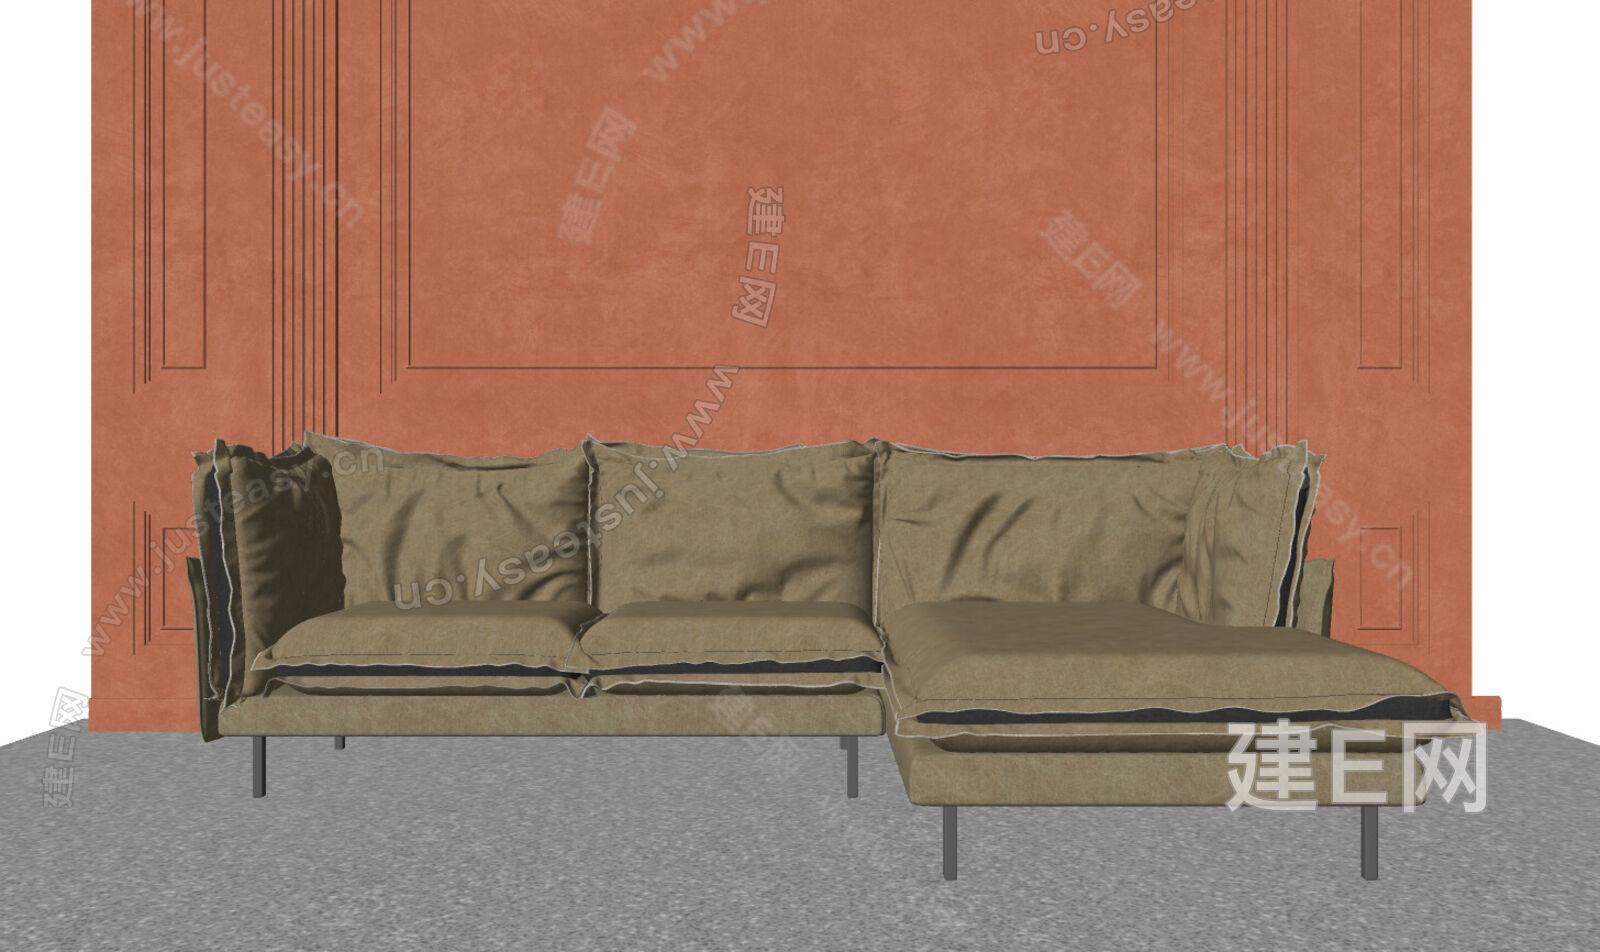 现代多人沙发sketchup模型